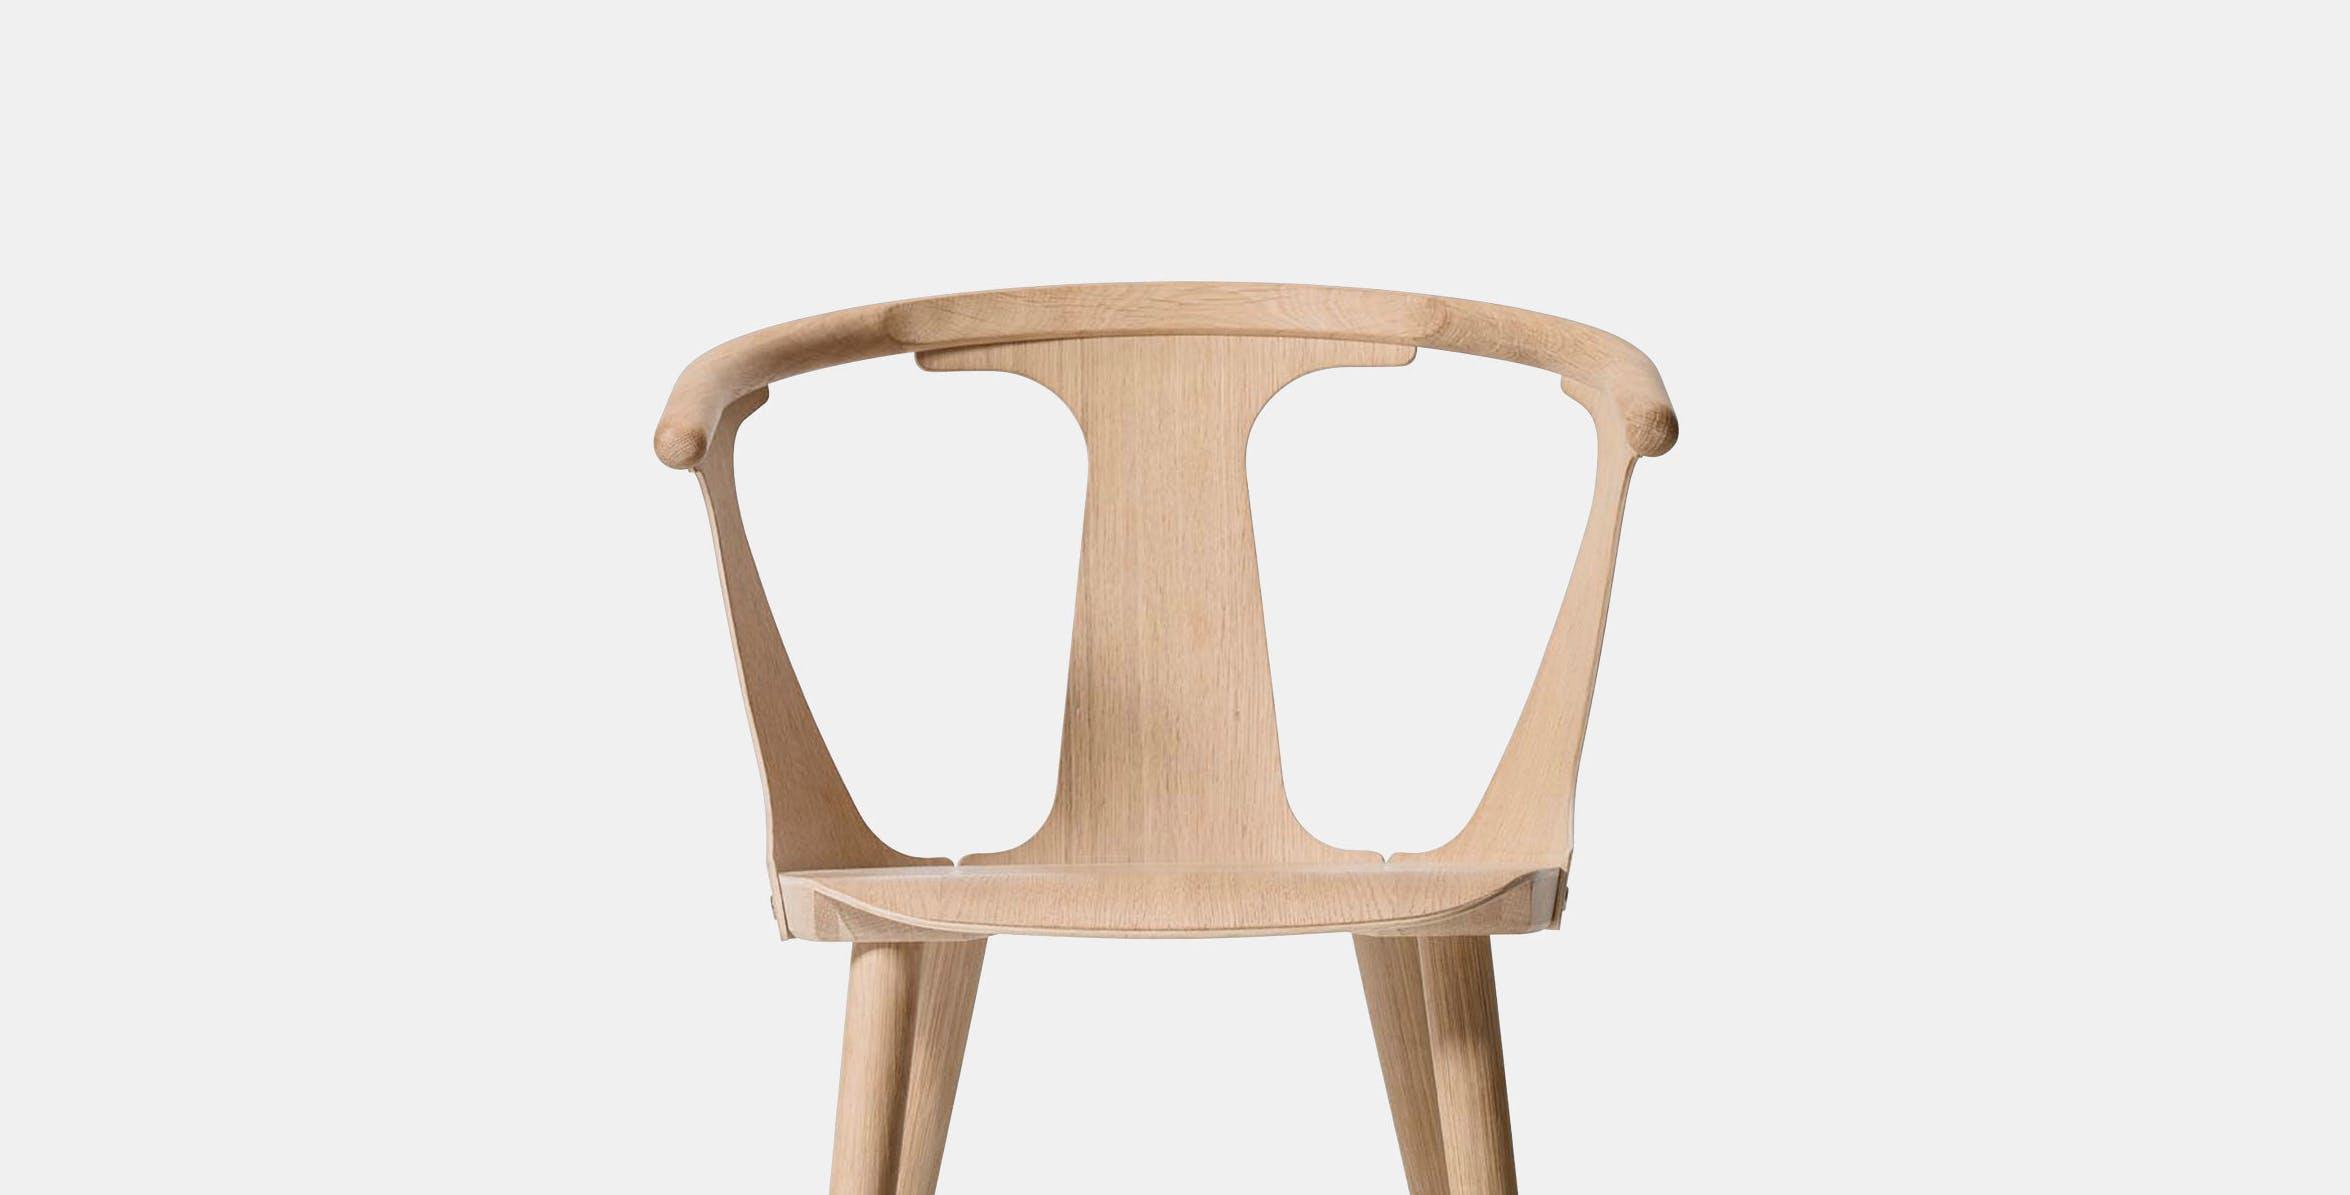 Designer Sami Kallio